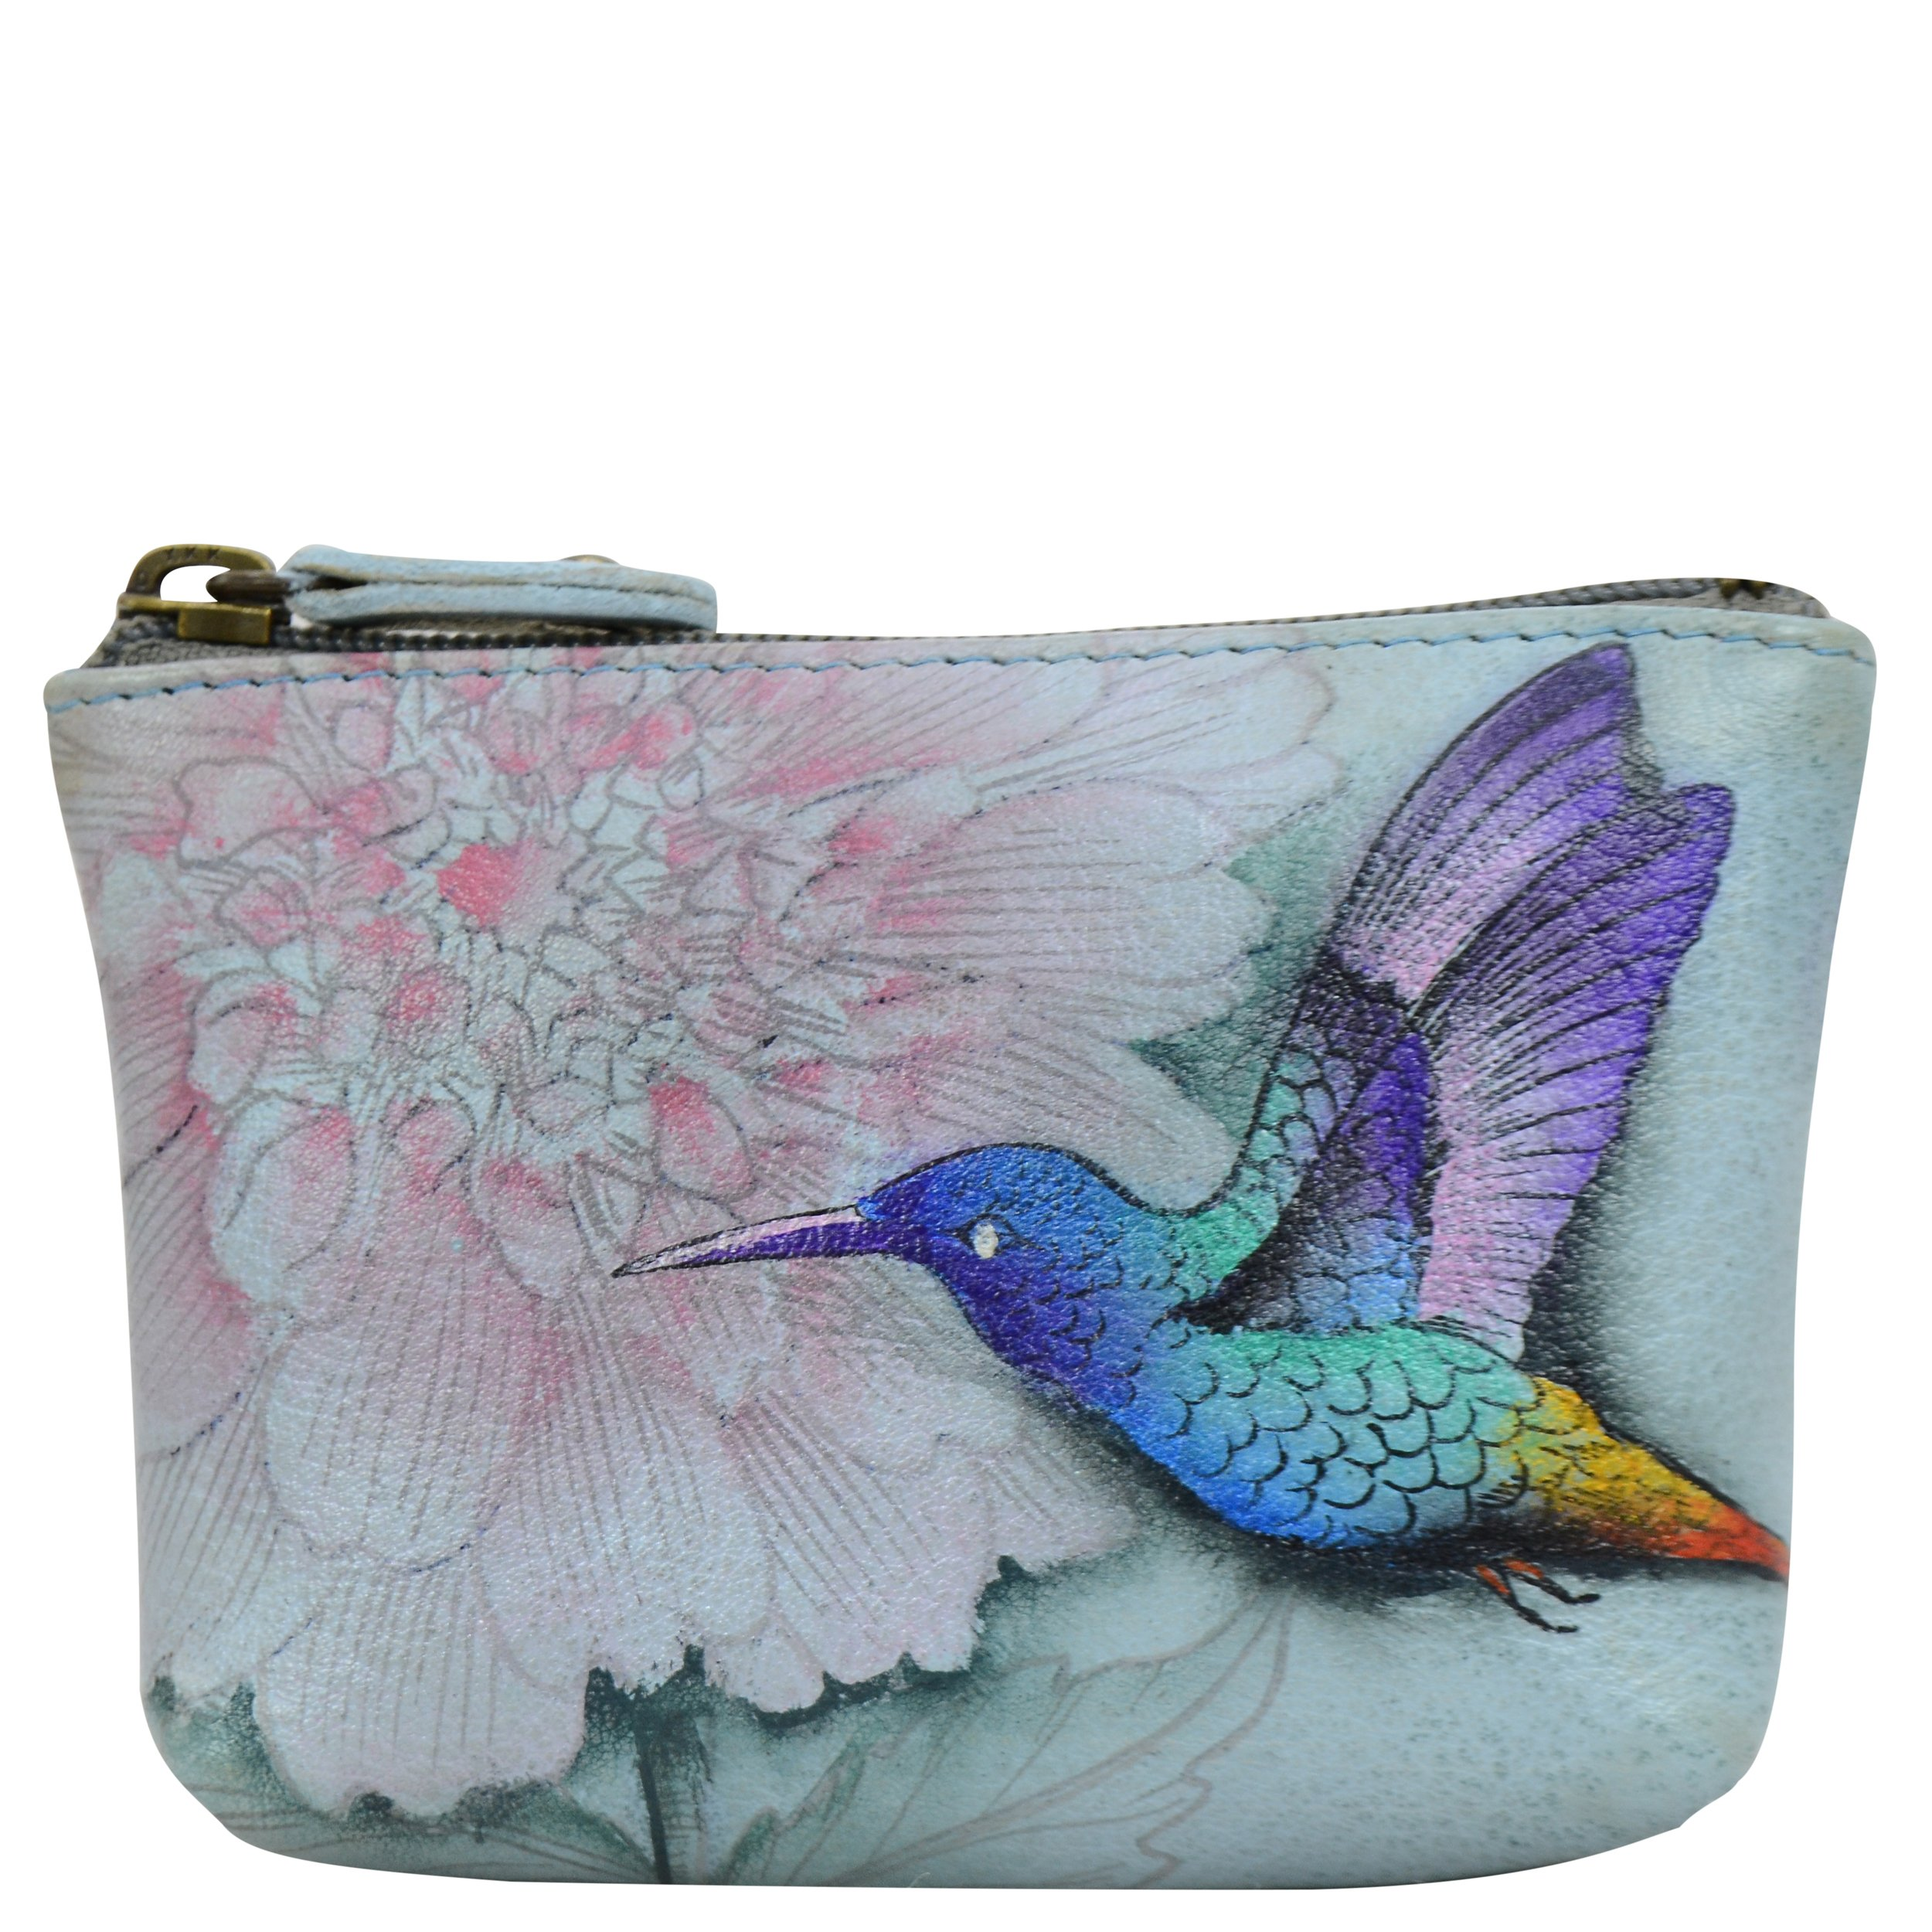 Anuschka Women's Genuine Leather Coin Pouch | Hand Painted Original Artwork | Rainbow Birds by Anuschka